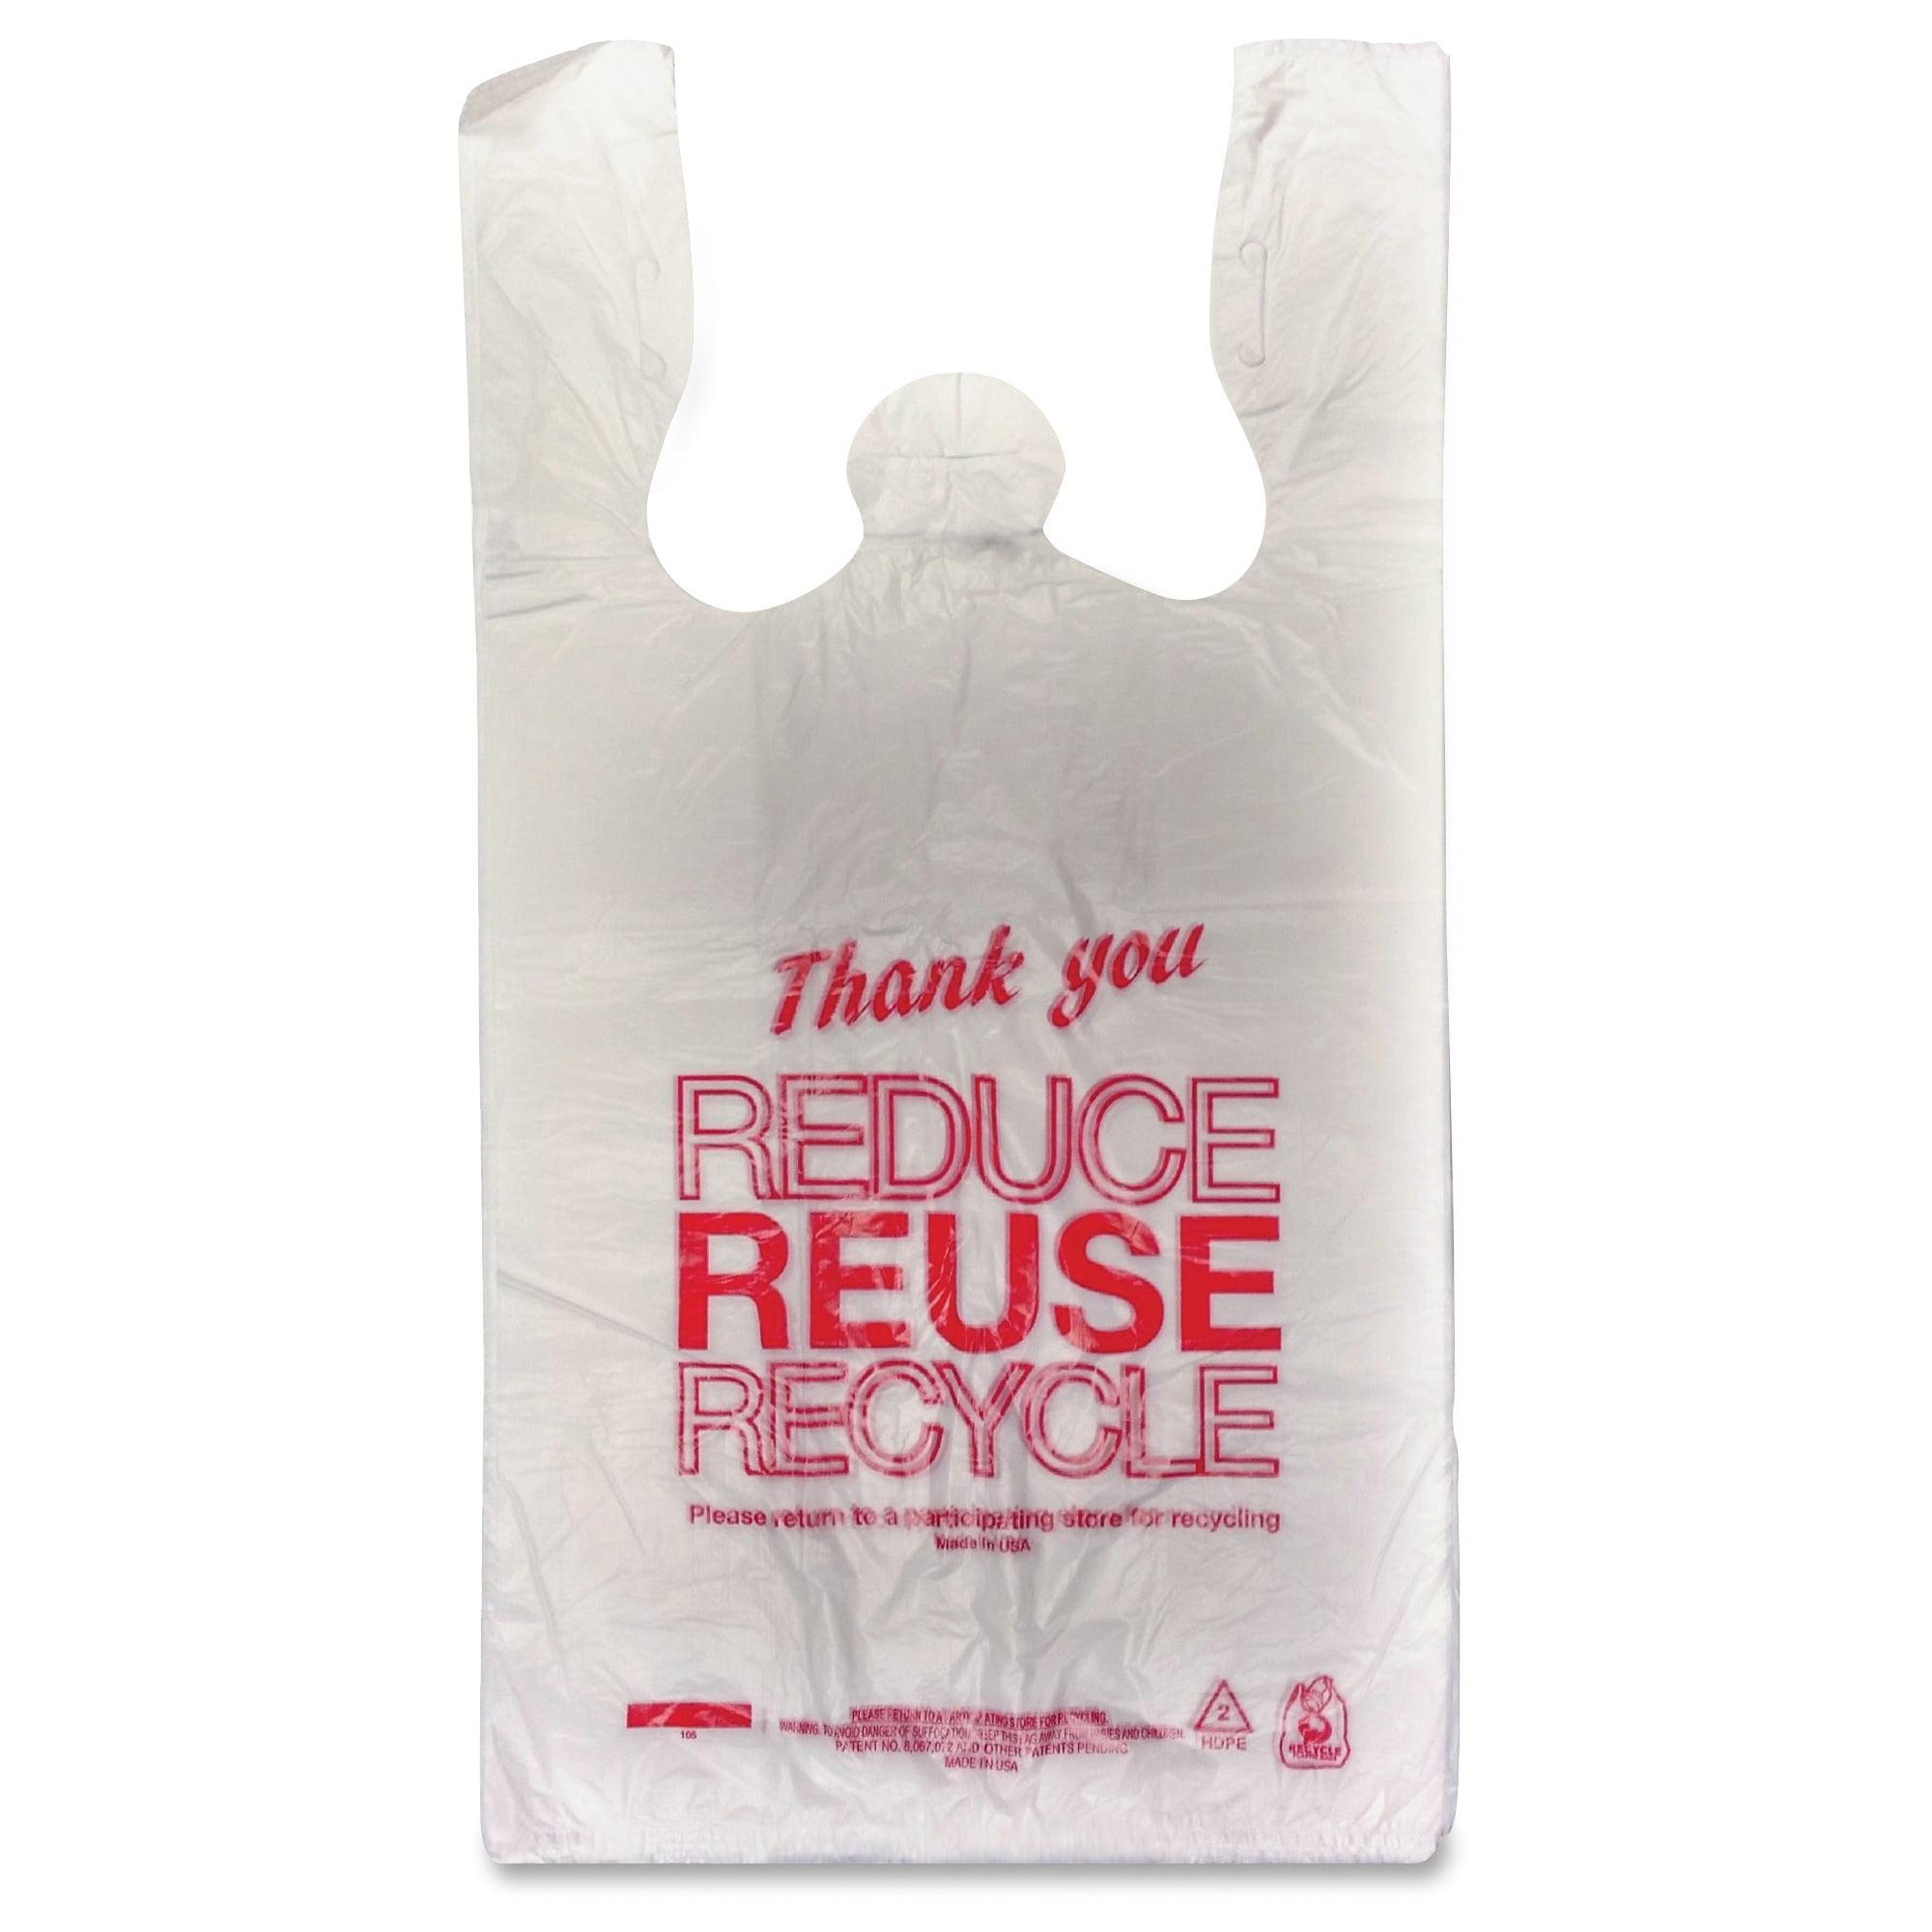 "Unistar Plastics Thank You Eco-friendly Bag - 11.50"" X 21.50"" X 6.50"" - 47 Mil [1194 Micron] Thickness - Red - Plastic - 1000/carton (upl-13671368)"